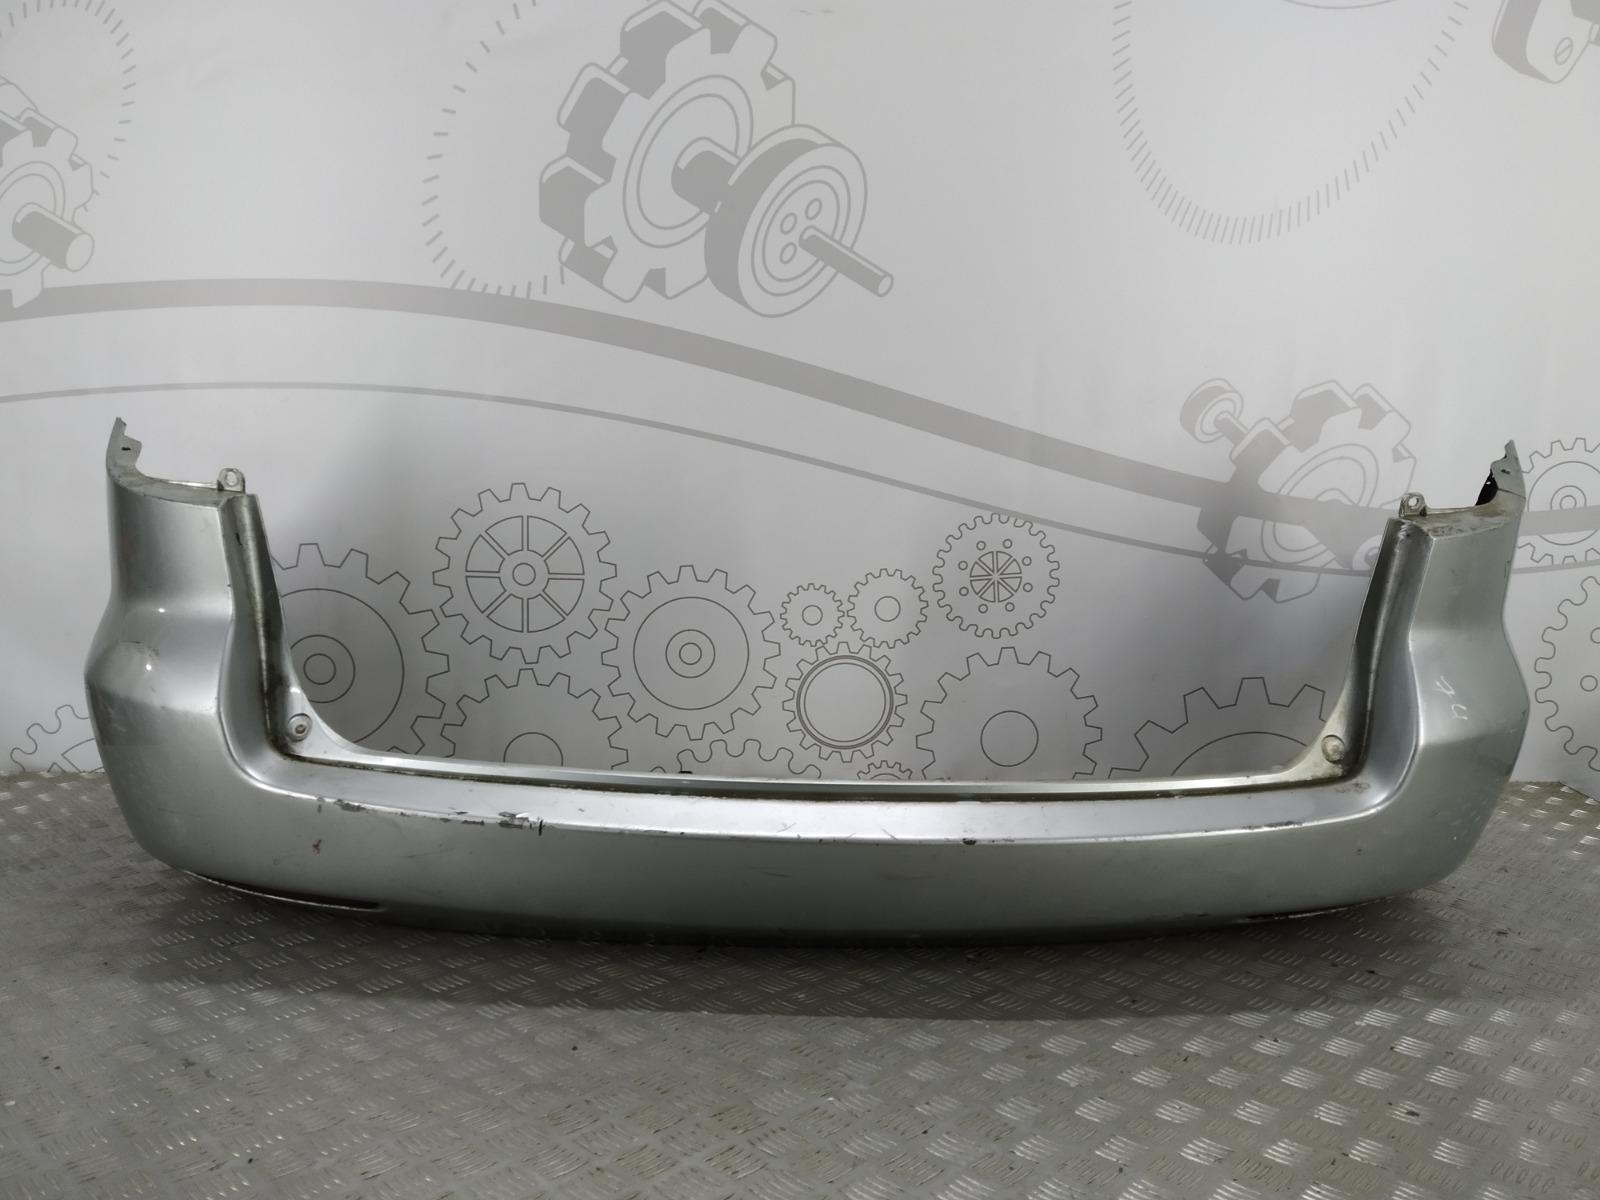 Бампер задний Mazda 6 2.0 I 2004 (б/у)